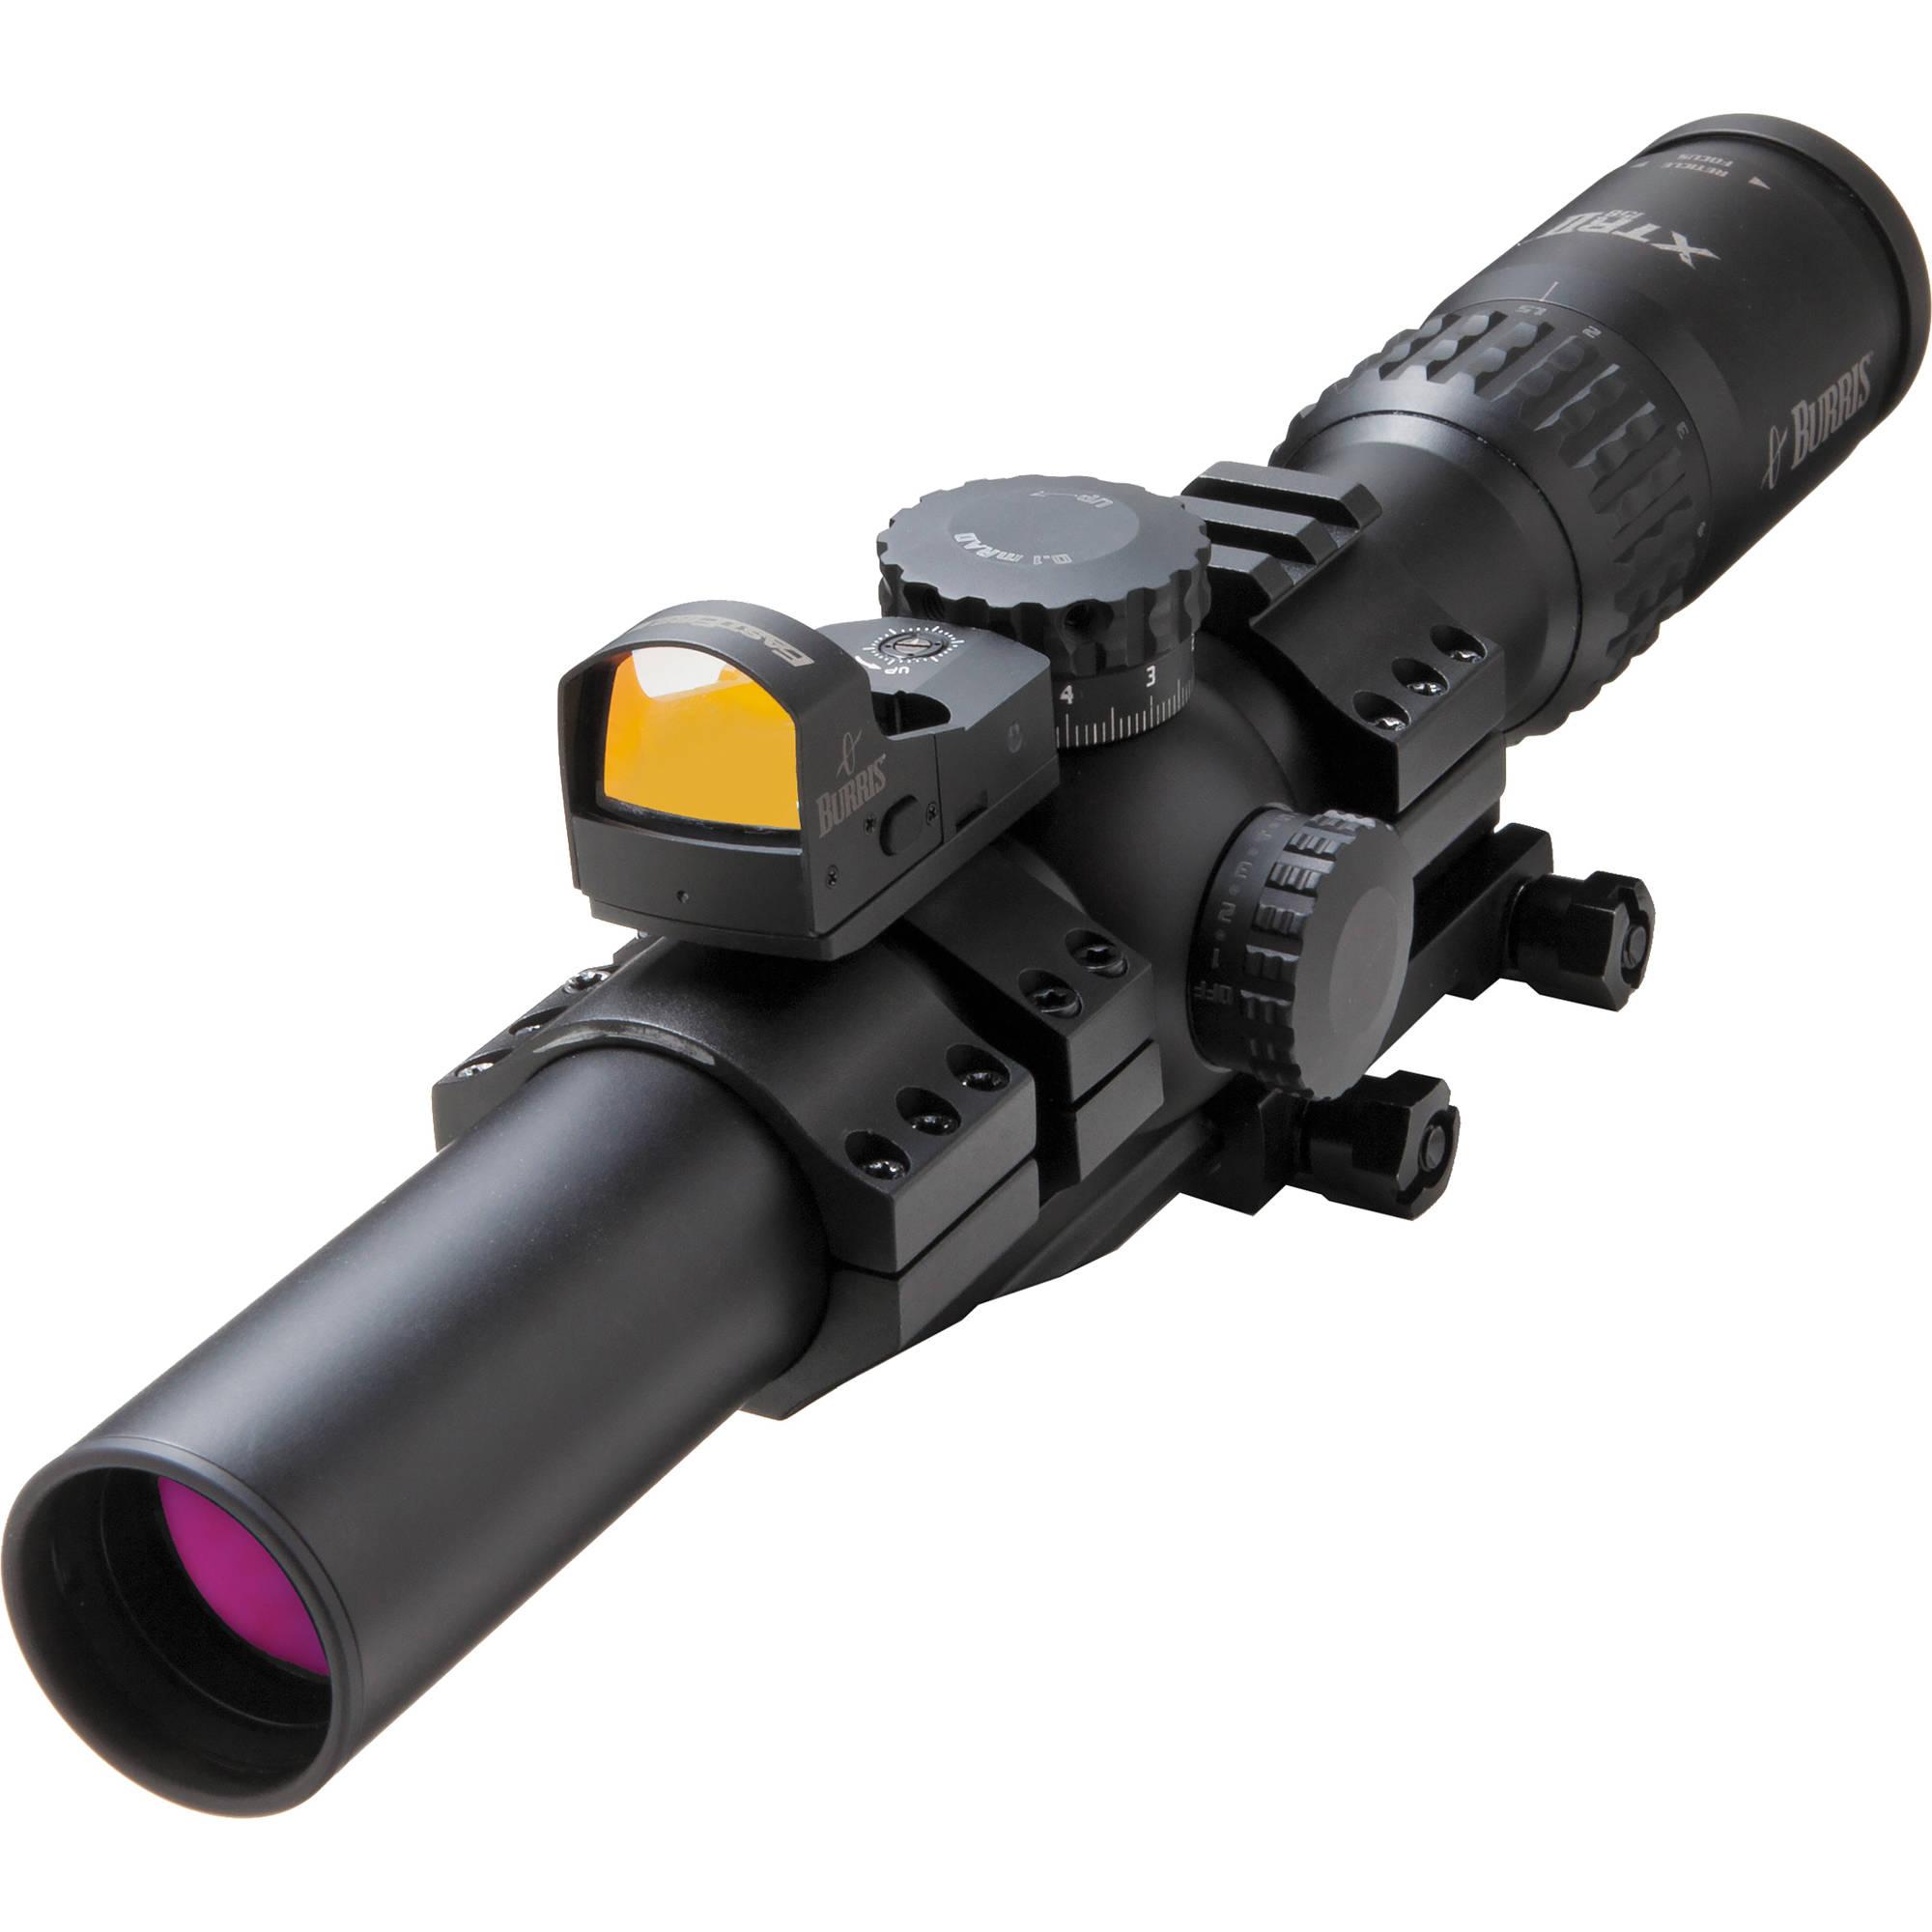 Burris Optics 15 8x28 Xtr Ii Riflescope Fastfire Iii 201011 Bh